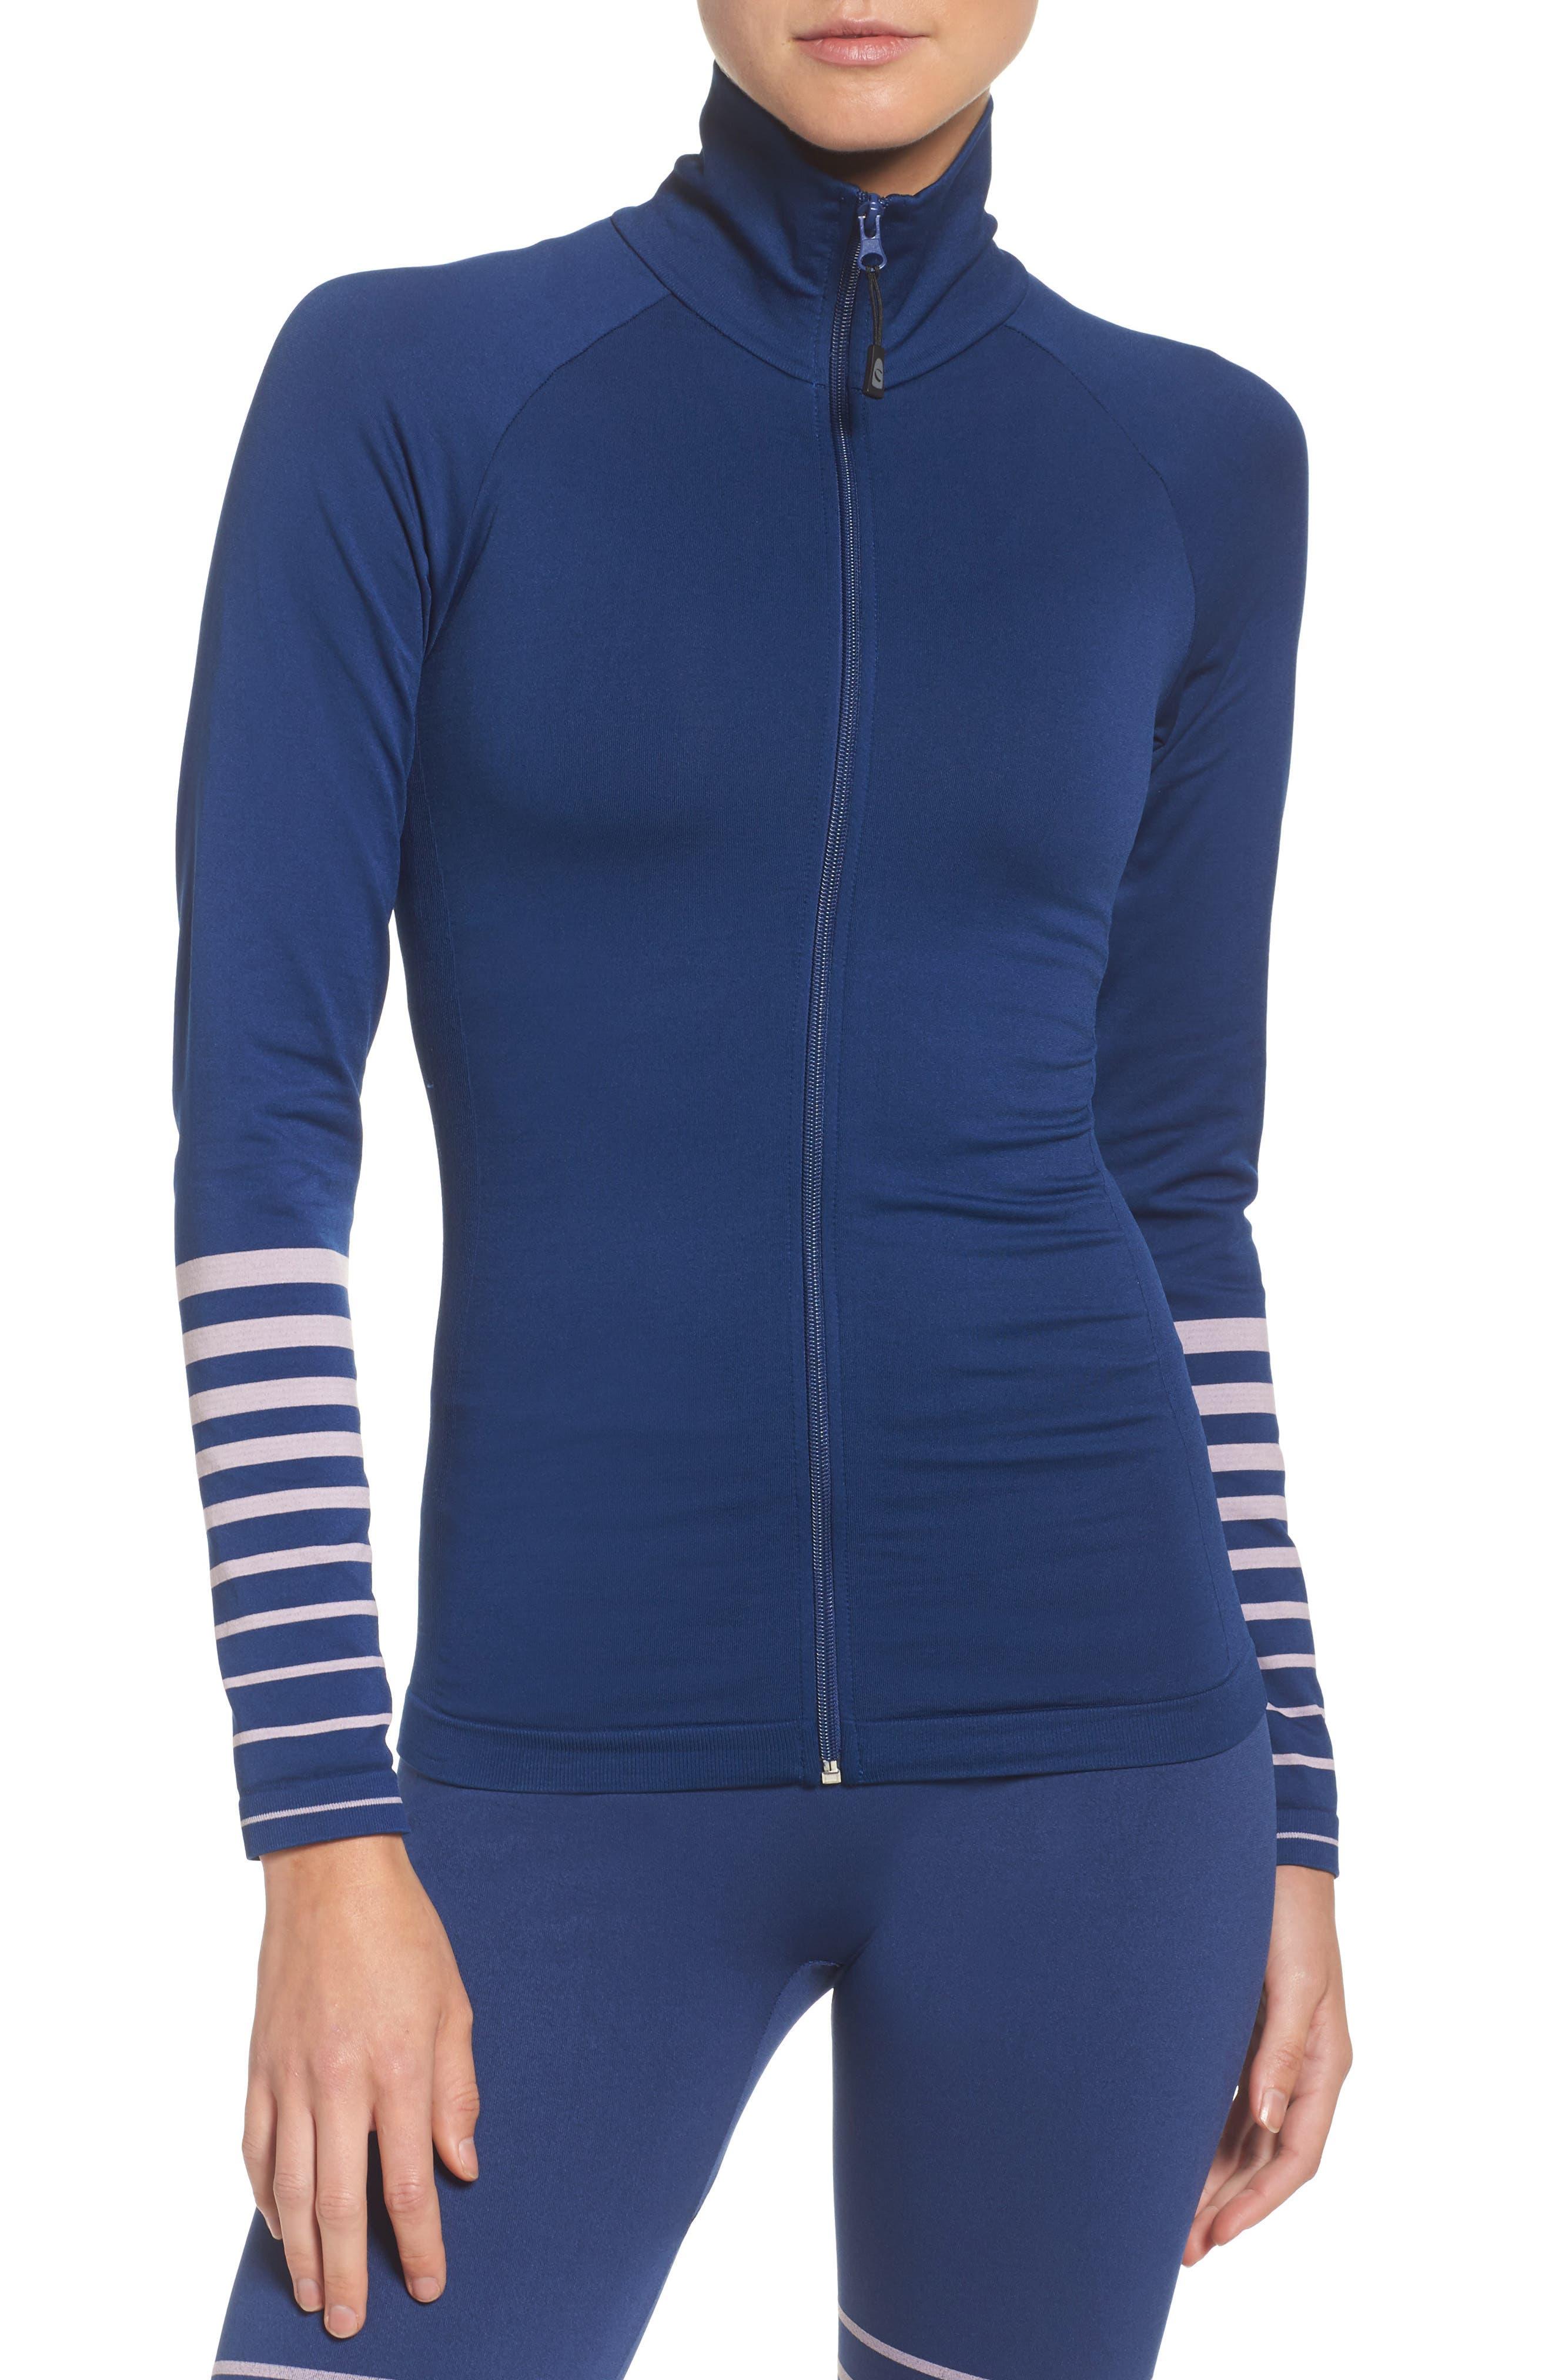 Finish Line Training Jacket,                         Main,                         color, Estate Blue And Crystal Pink